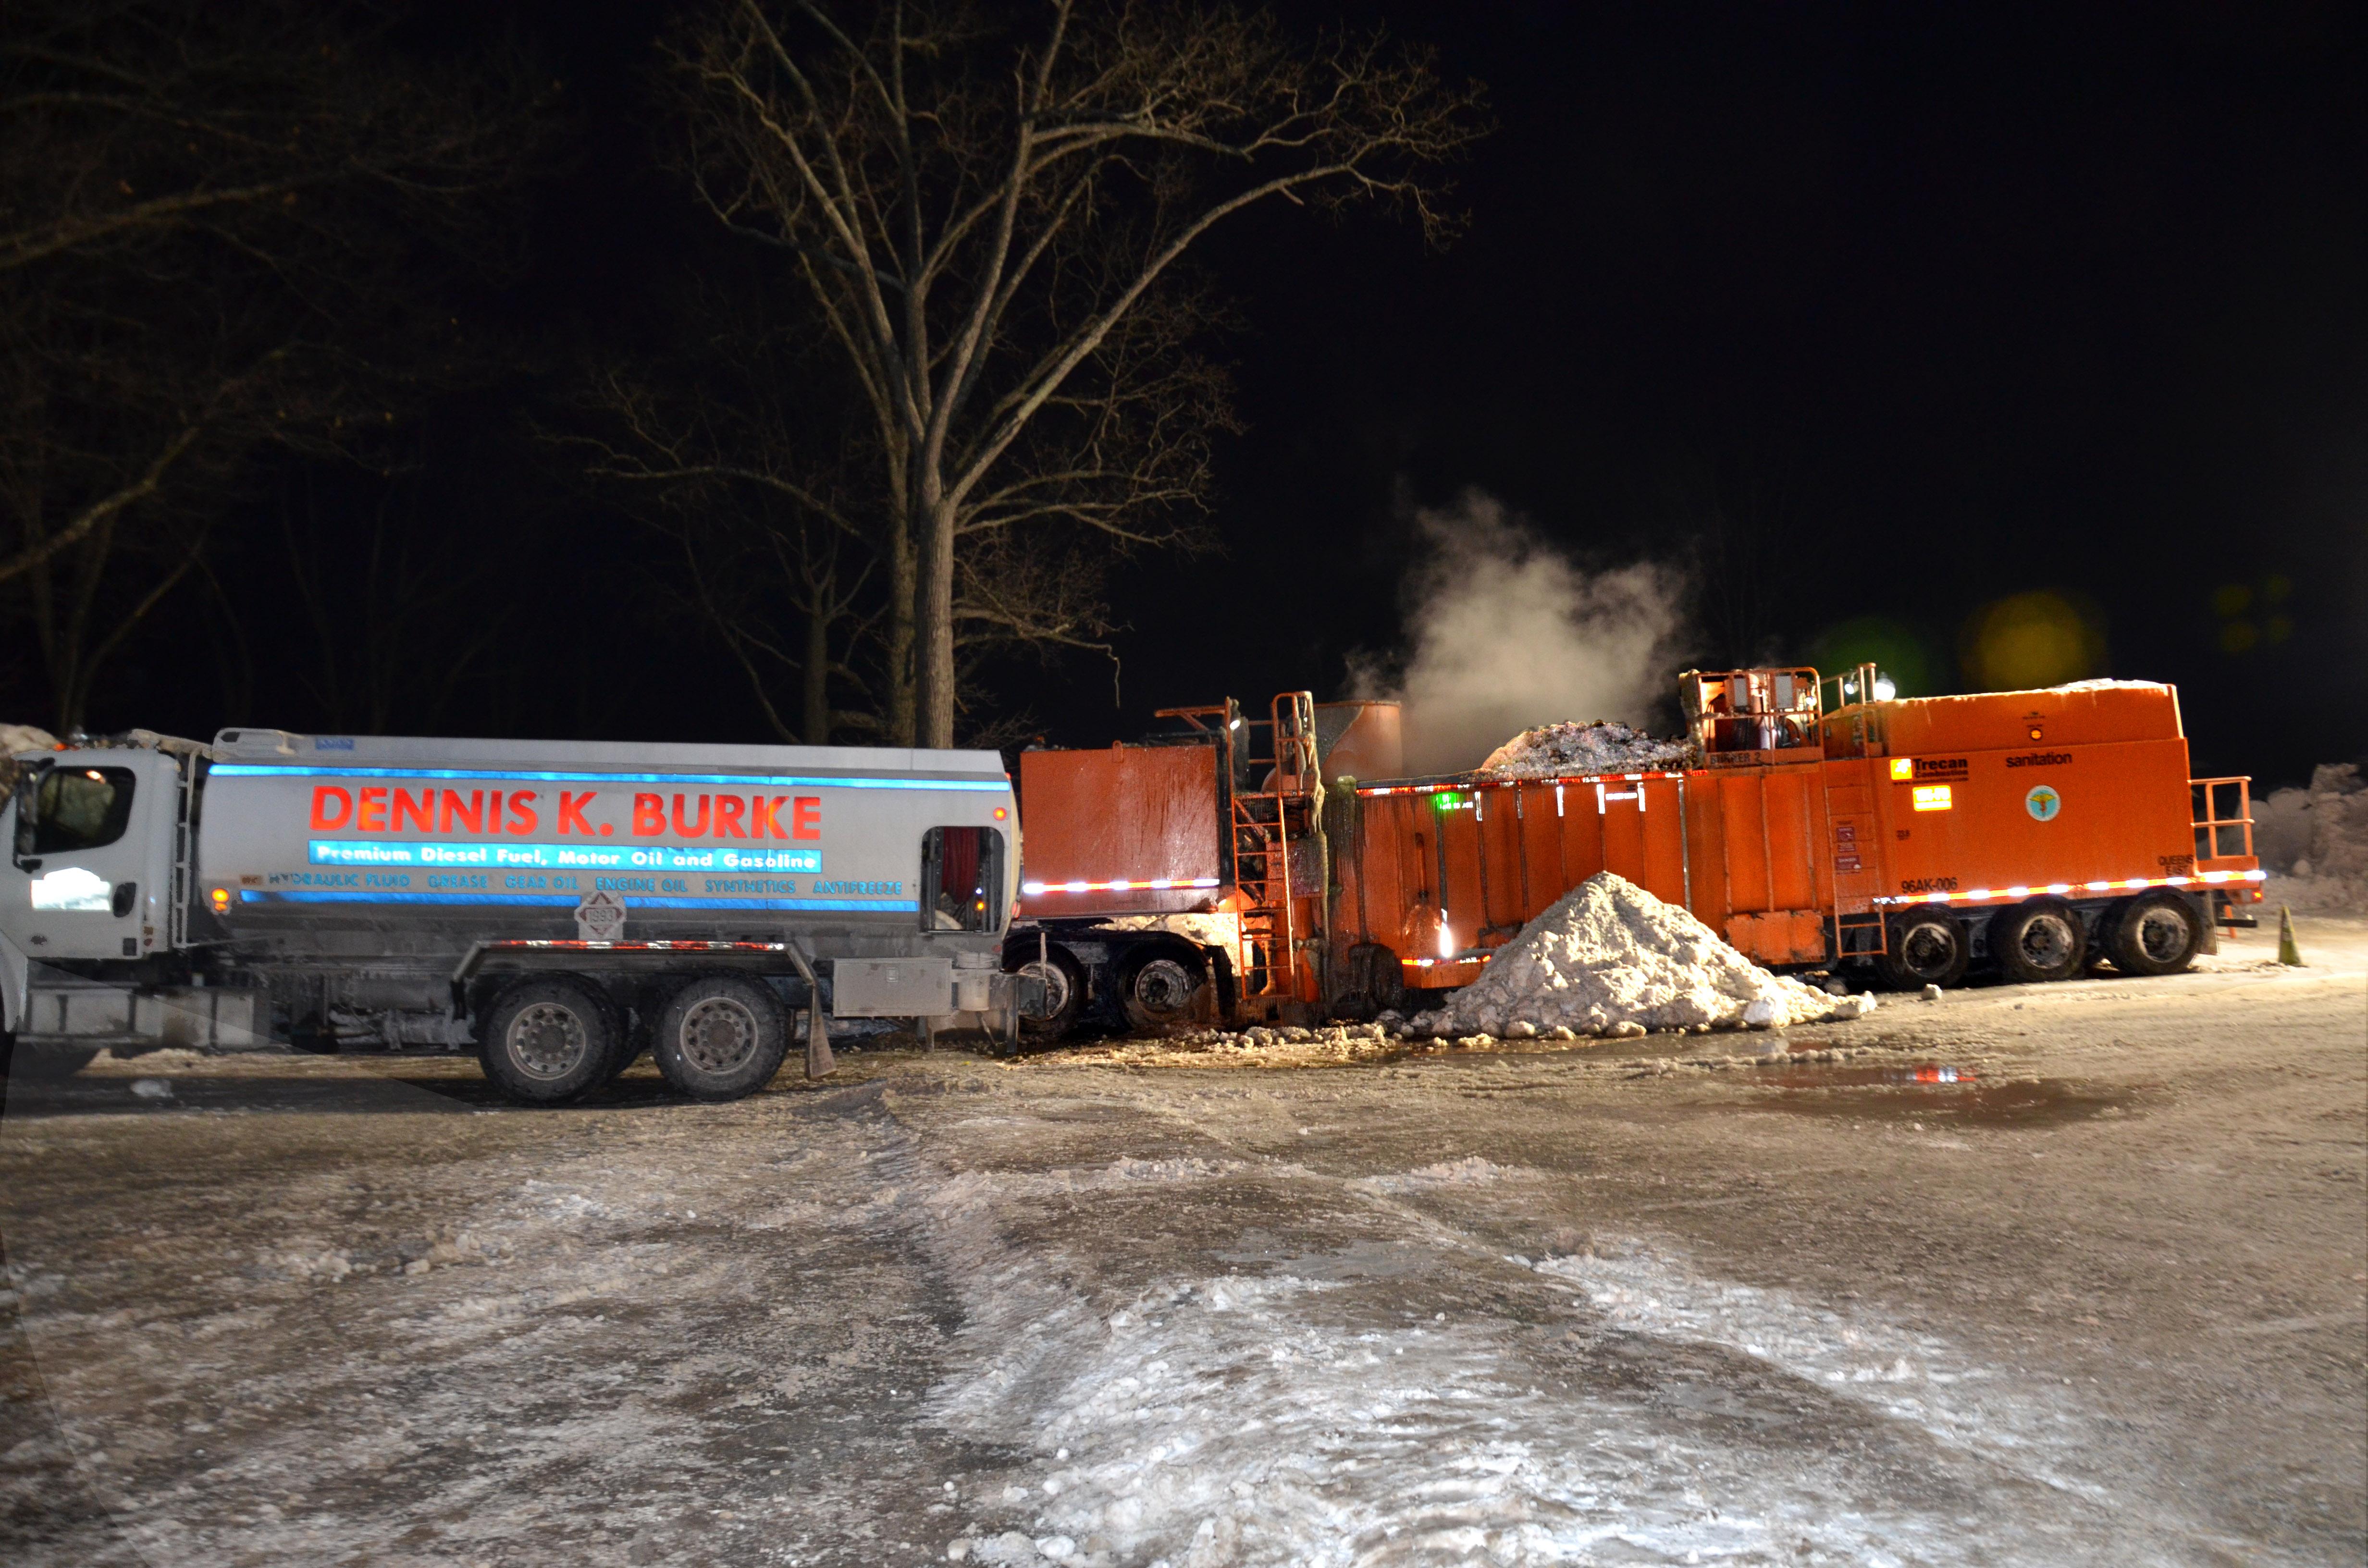 Dennis K Burke Fueling NY Snow Melters in Boston's Record Snowfall